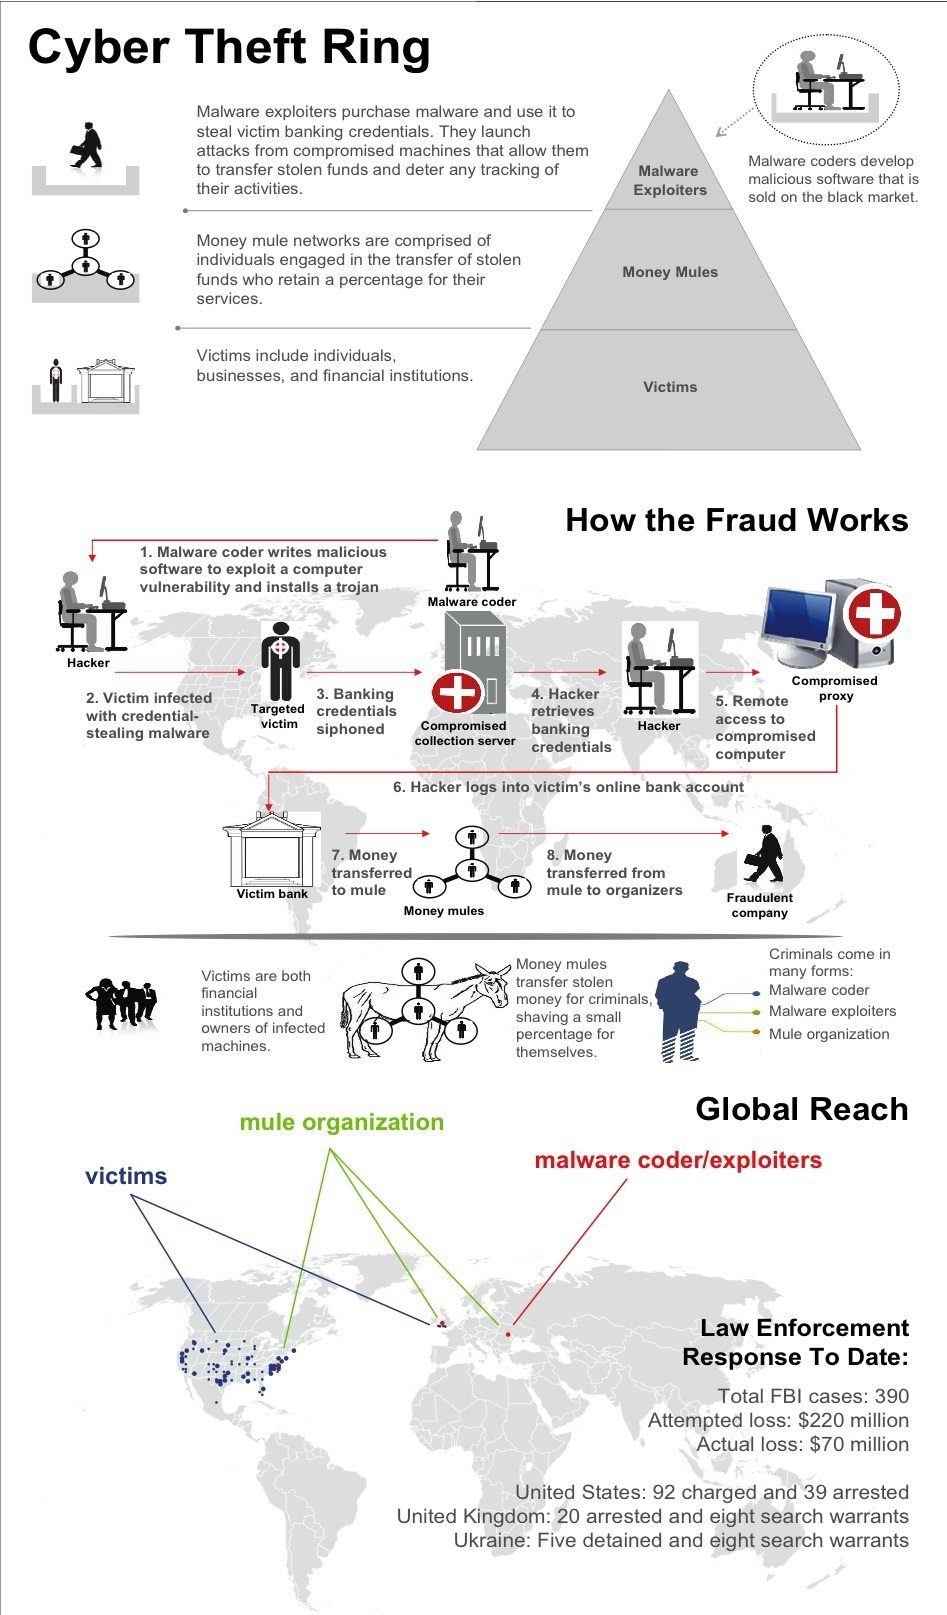 FBI_Fraud_Scheme_Zeus_Trojan